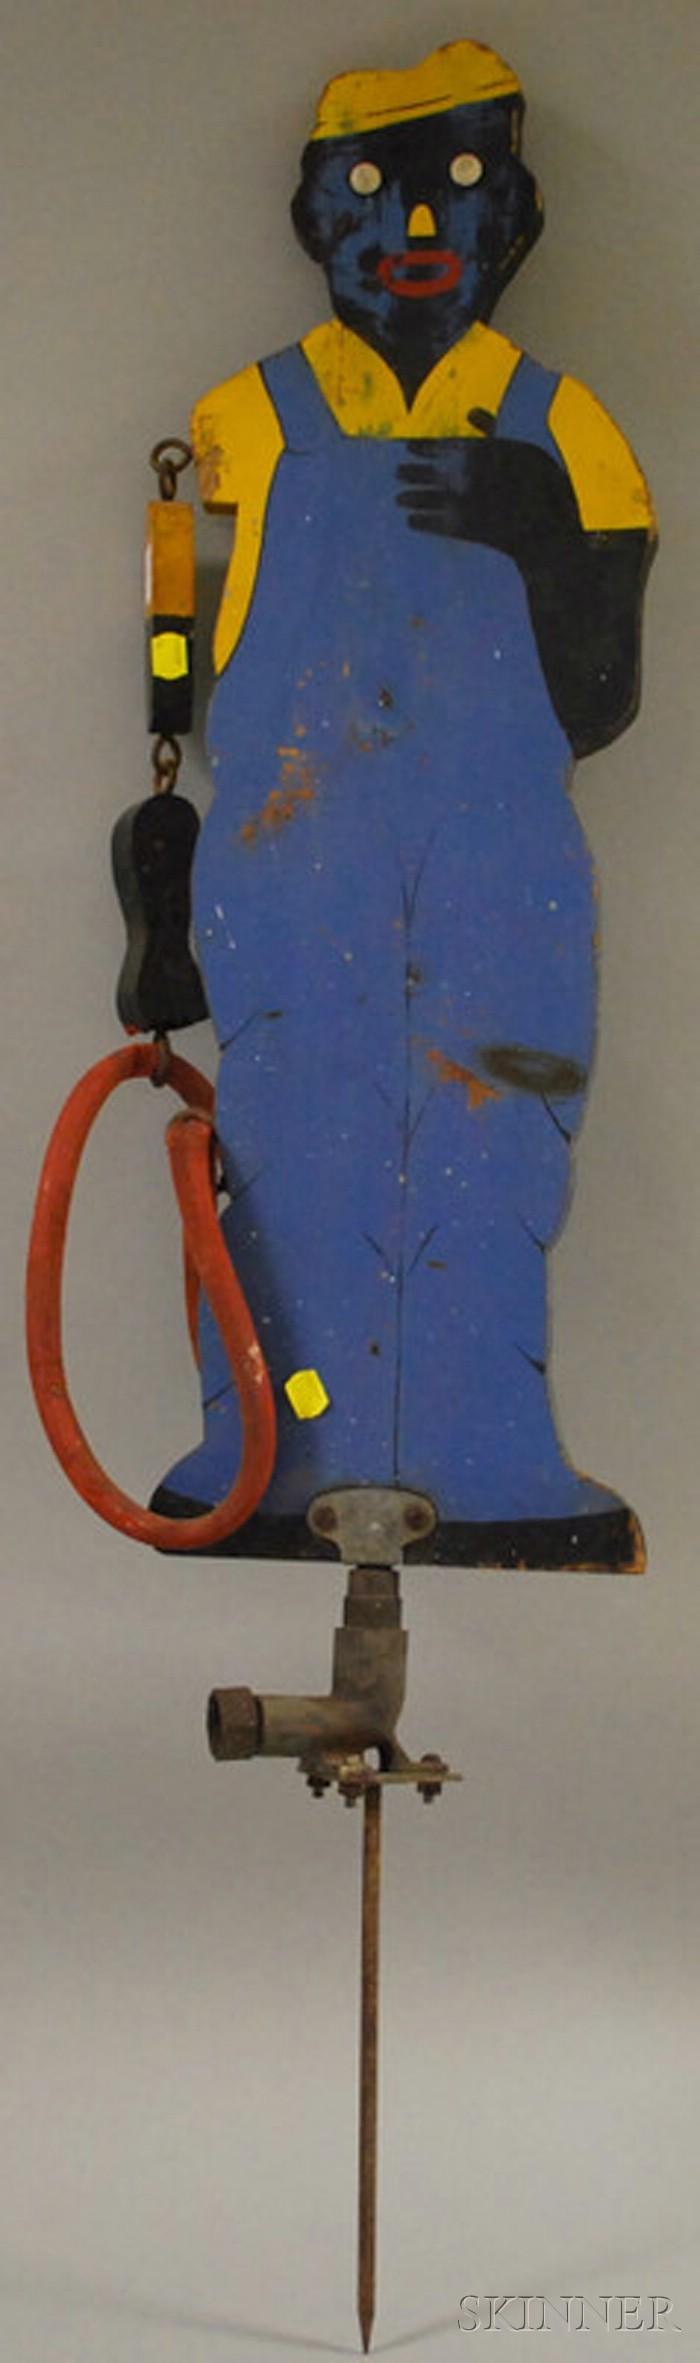 Painted Wooden Black Gardener and Hose Sprinkler Figure